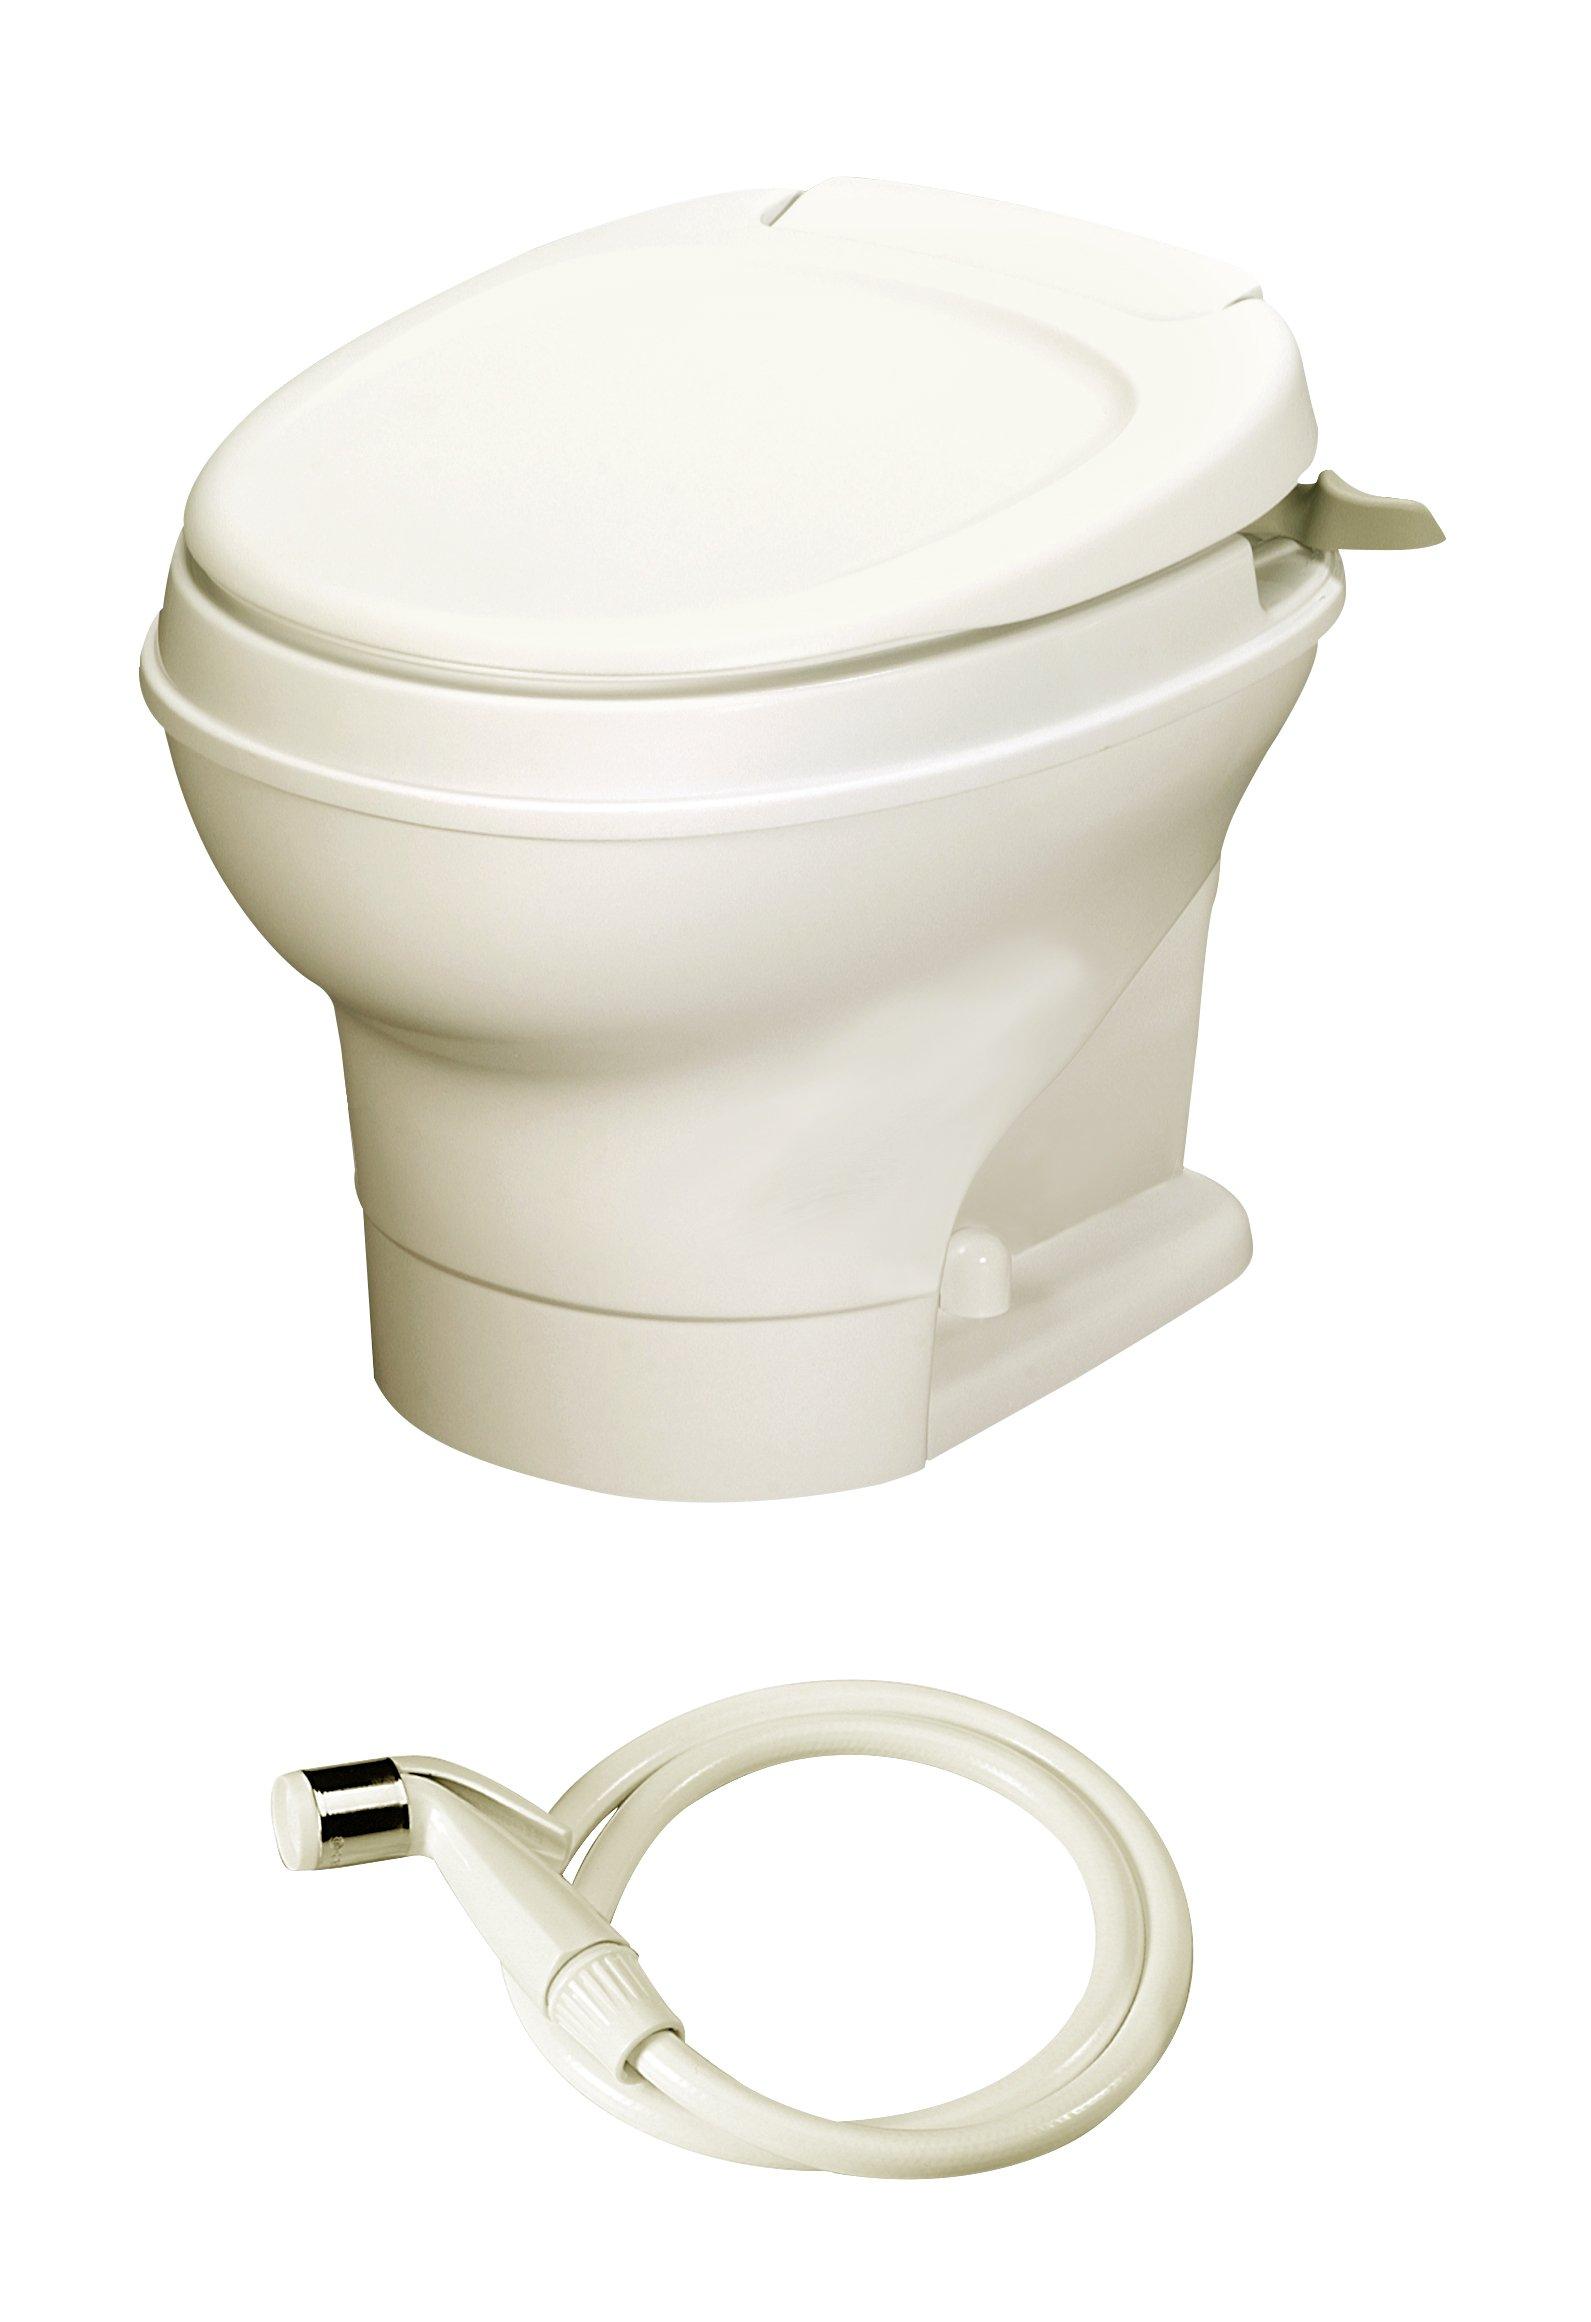 Aqua-Magic V RV Toilet Hand Flush with Hand Sprayer / Low Profile / Parchment - Thetford 31658 by Thetford